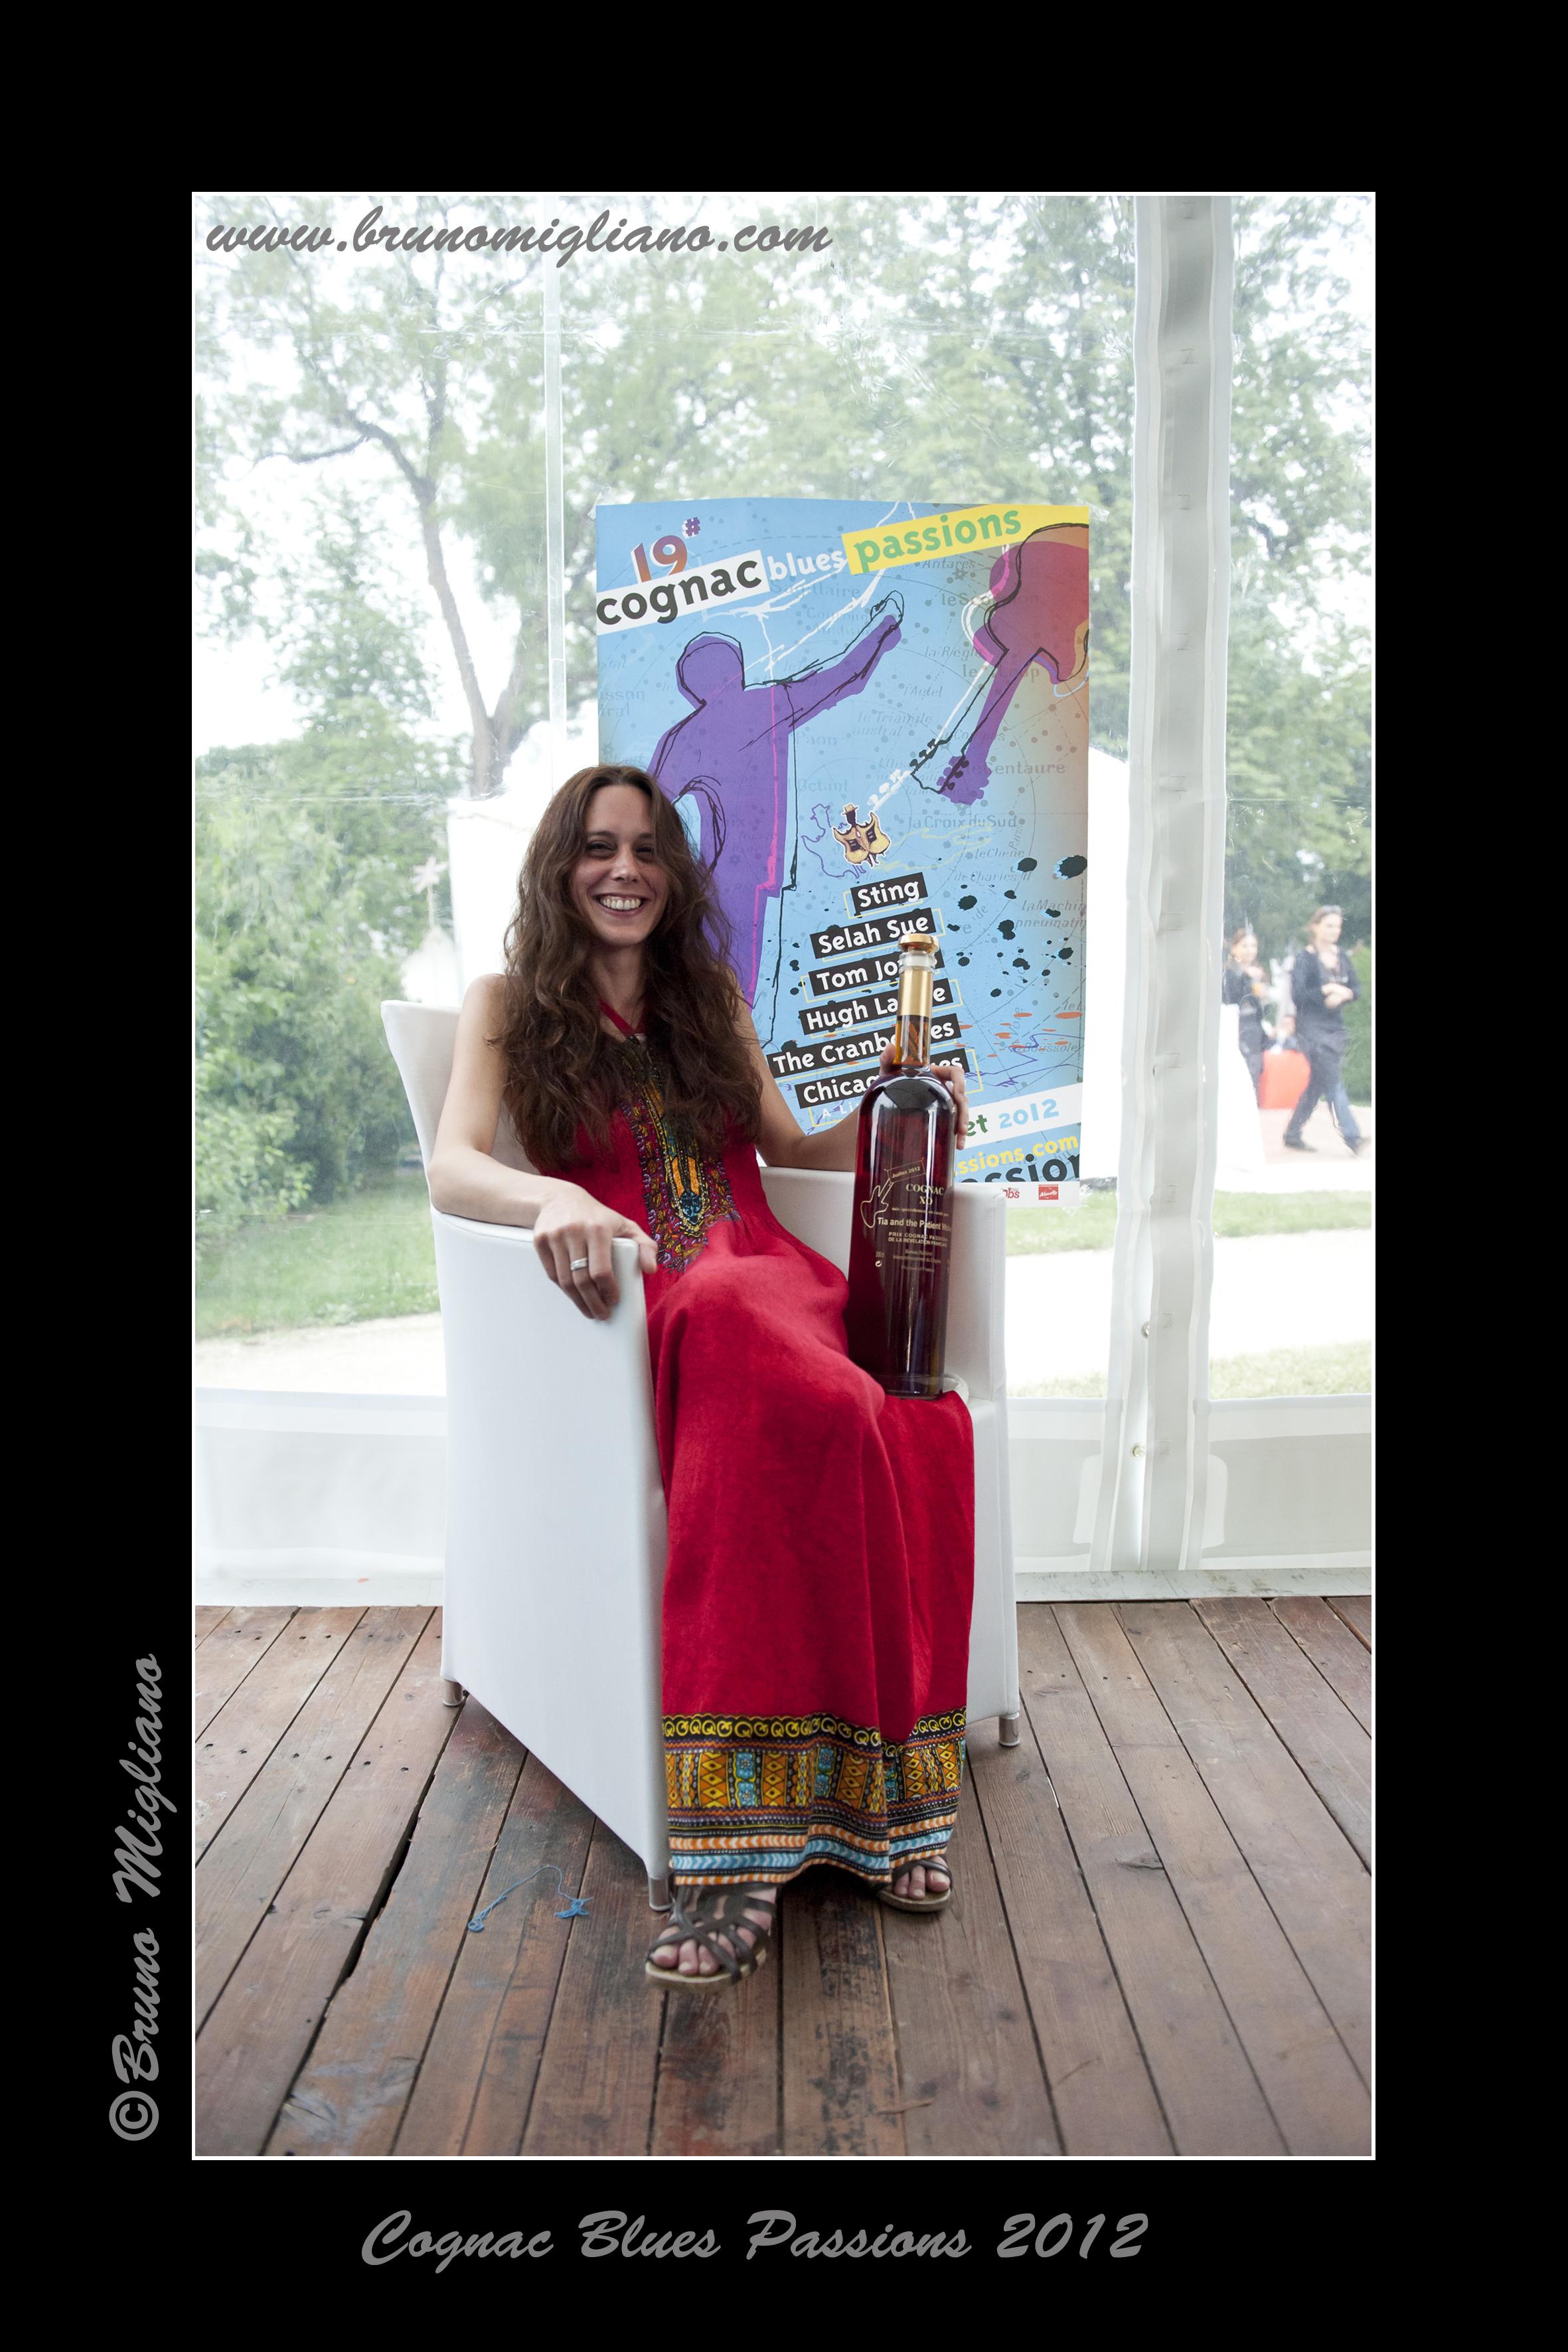 Cognac Blues Passions Award (FRA) 2012 - Tia - Photo Bruno Migliano